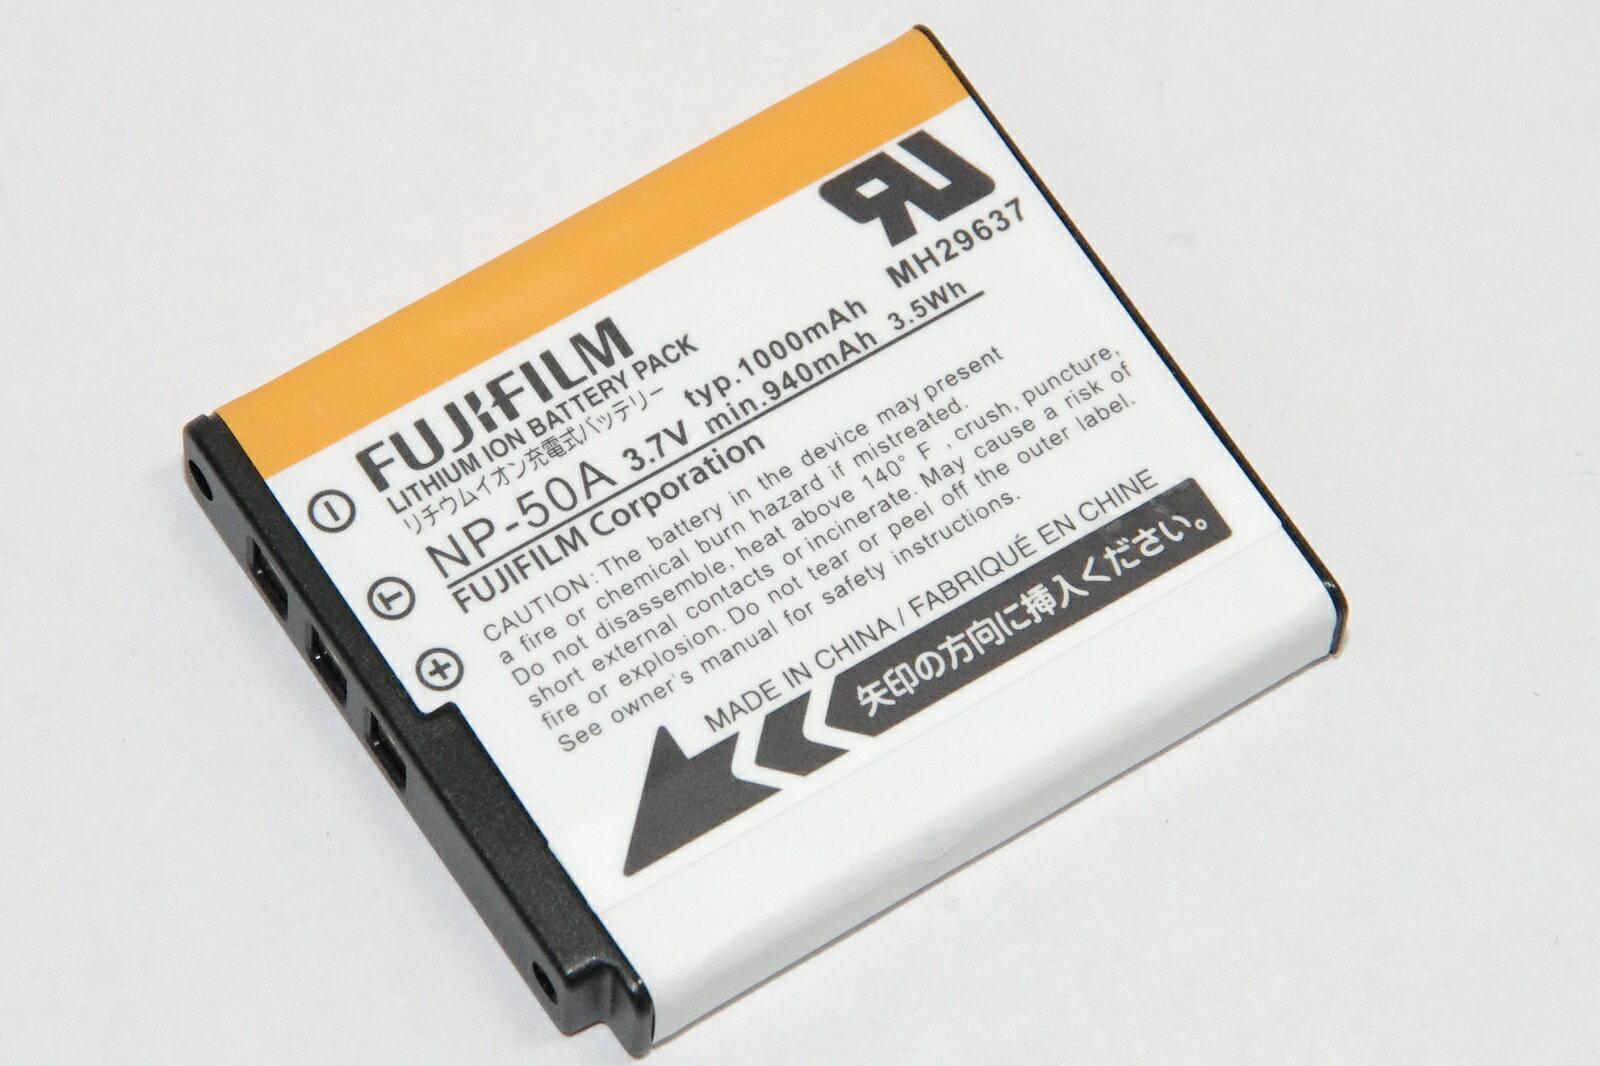 FUJIFILM フジフイルム NP-50A 送料無料・あす楽対応【メール便】NP50Aカメラバッテリー 充電池